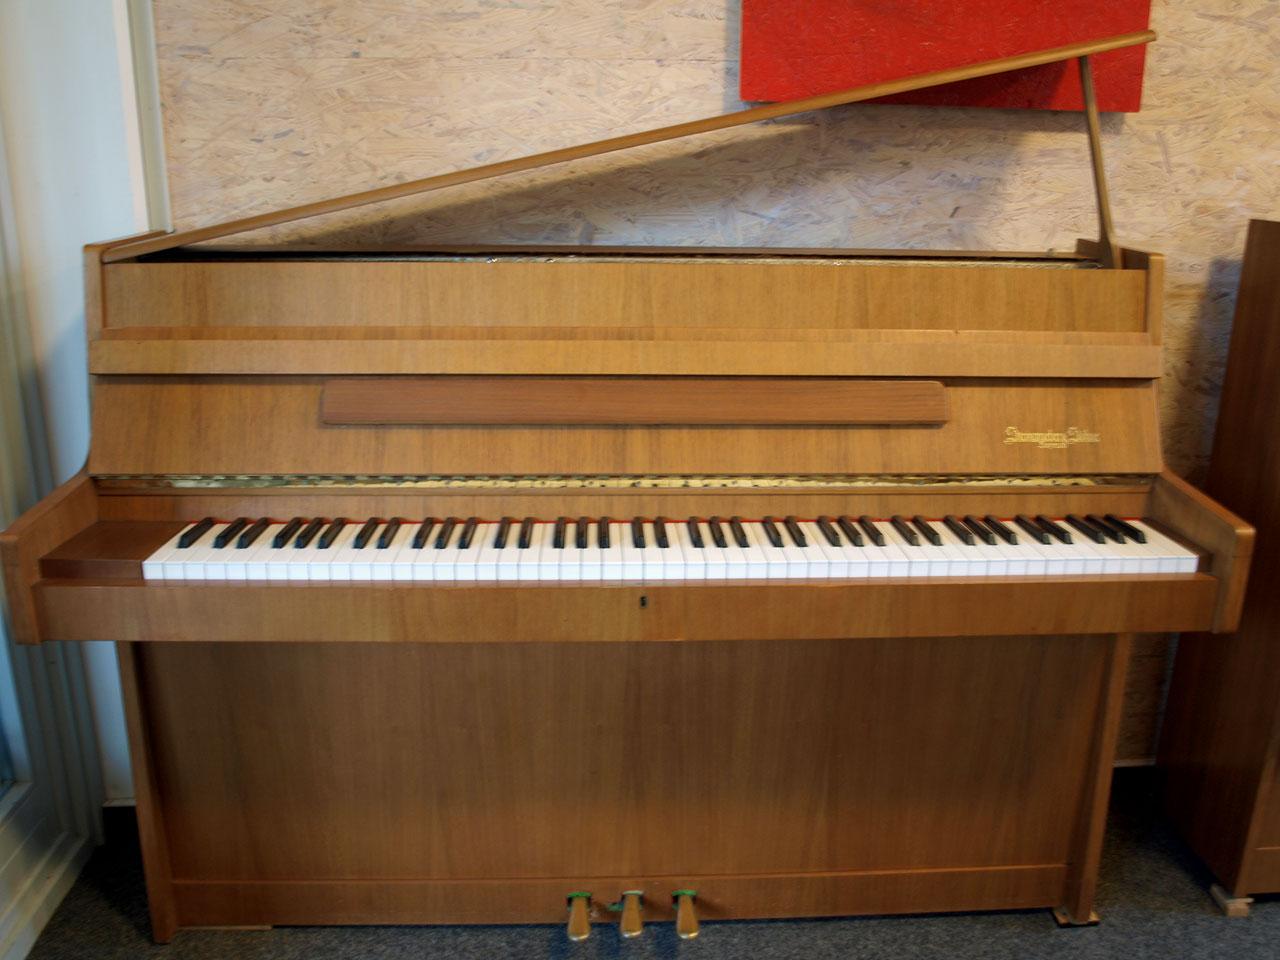 Steingräber & Söhne Klavier, Mod. 100